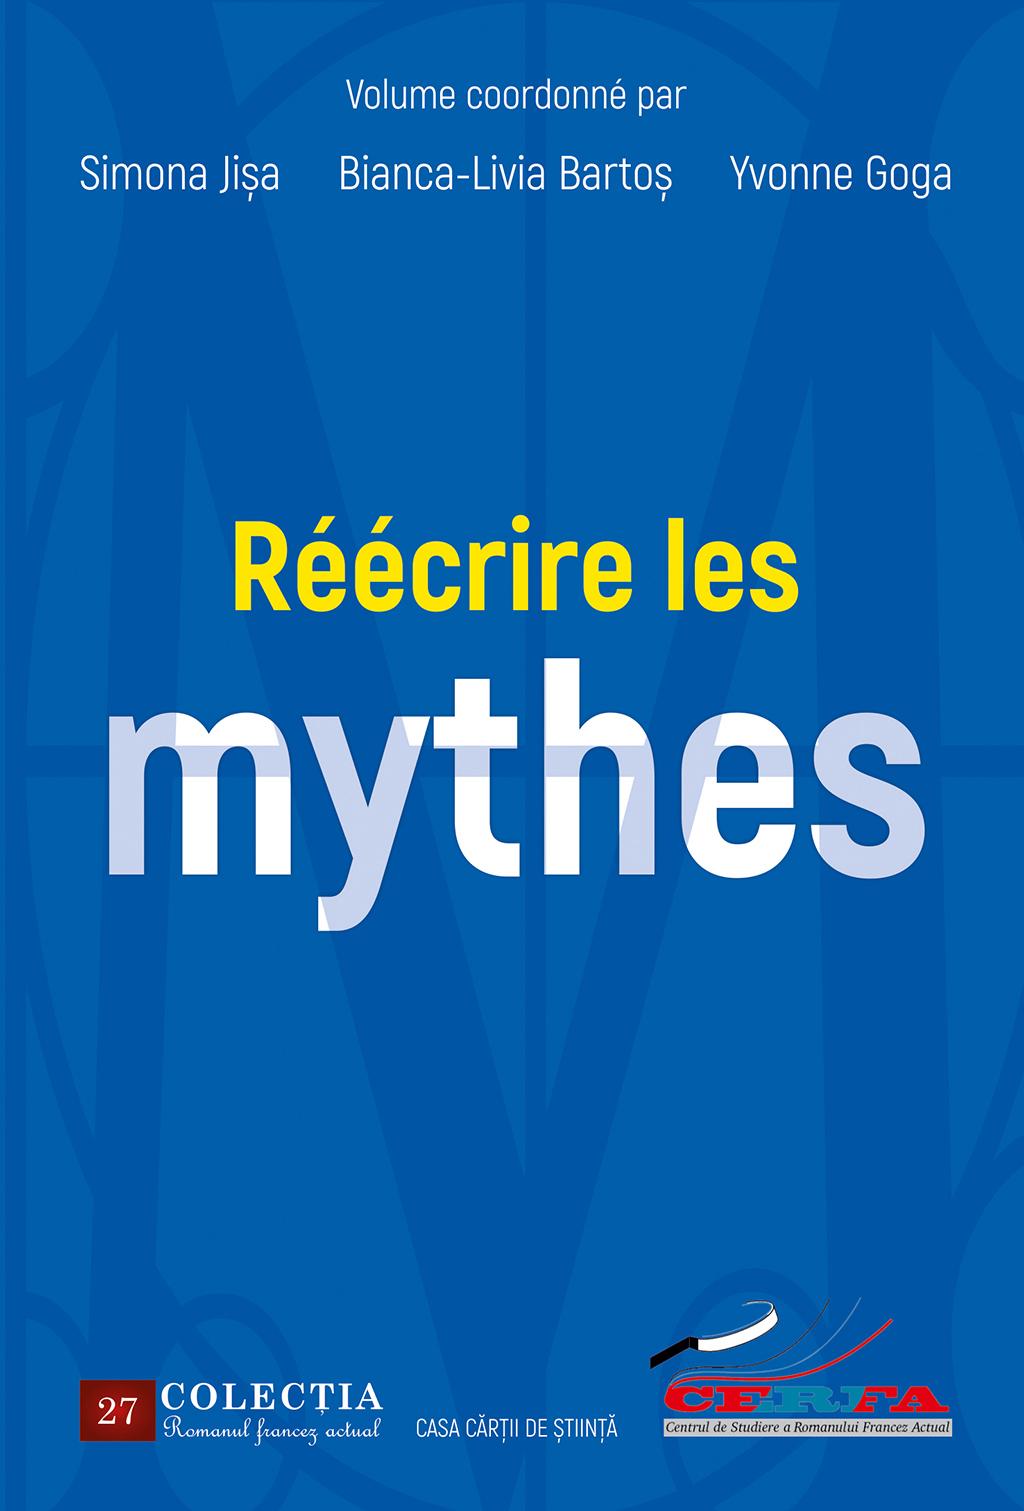 S. Jișa, B.-L. Bartoș, Y. Goga (dir.), Réécrire les mythes